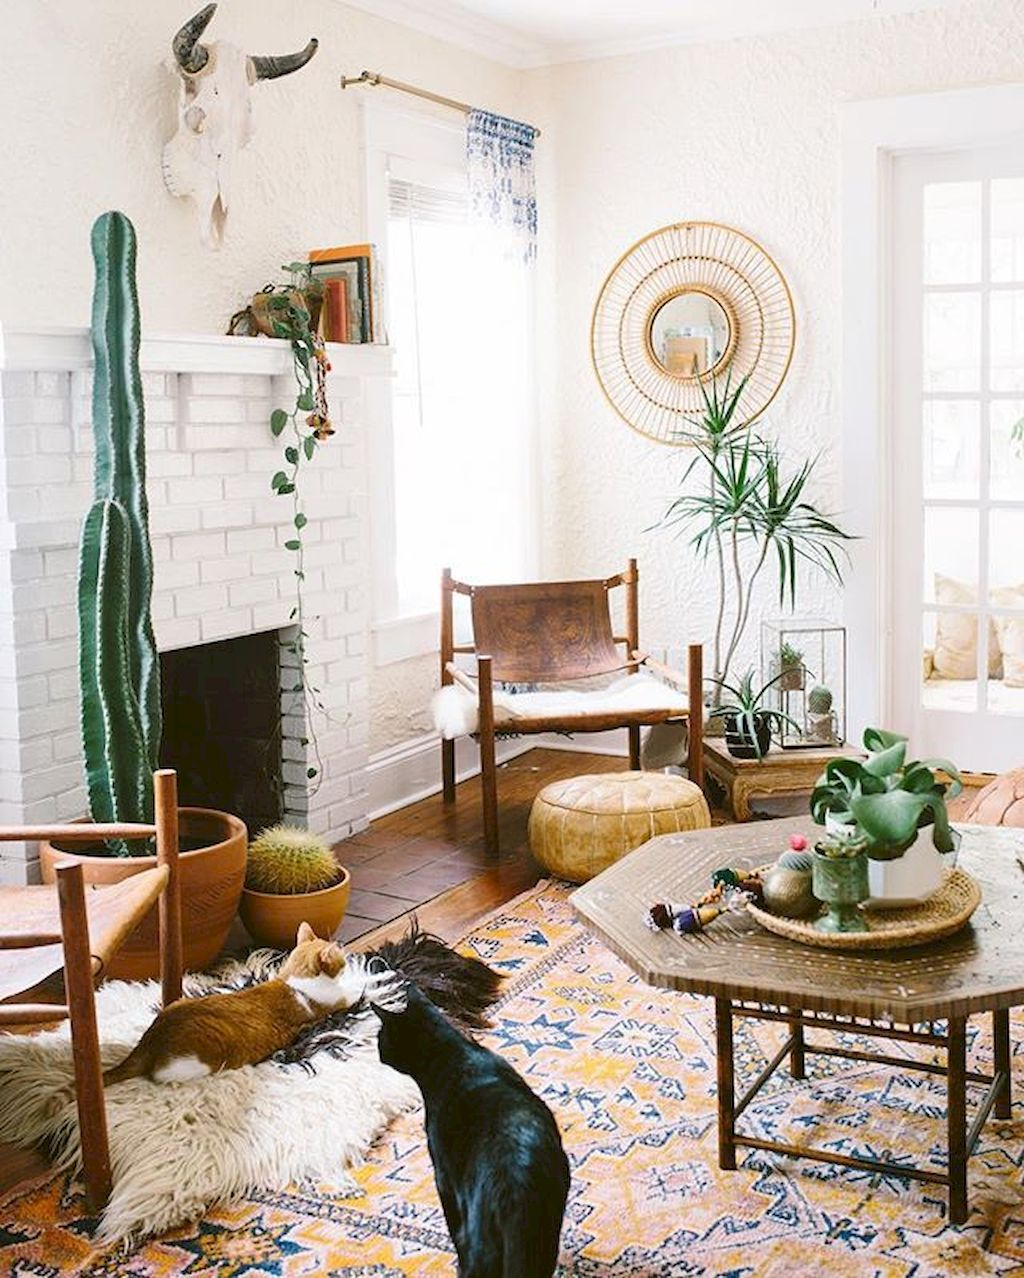 50 Urban Bohemian Living Room Ideas  Living Room Ideas Room Enchanting Bohemian Living Room Design Decorating Inspiration